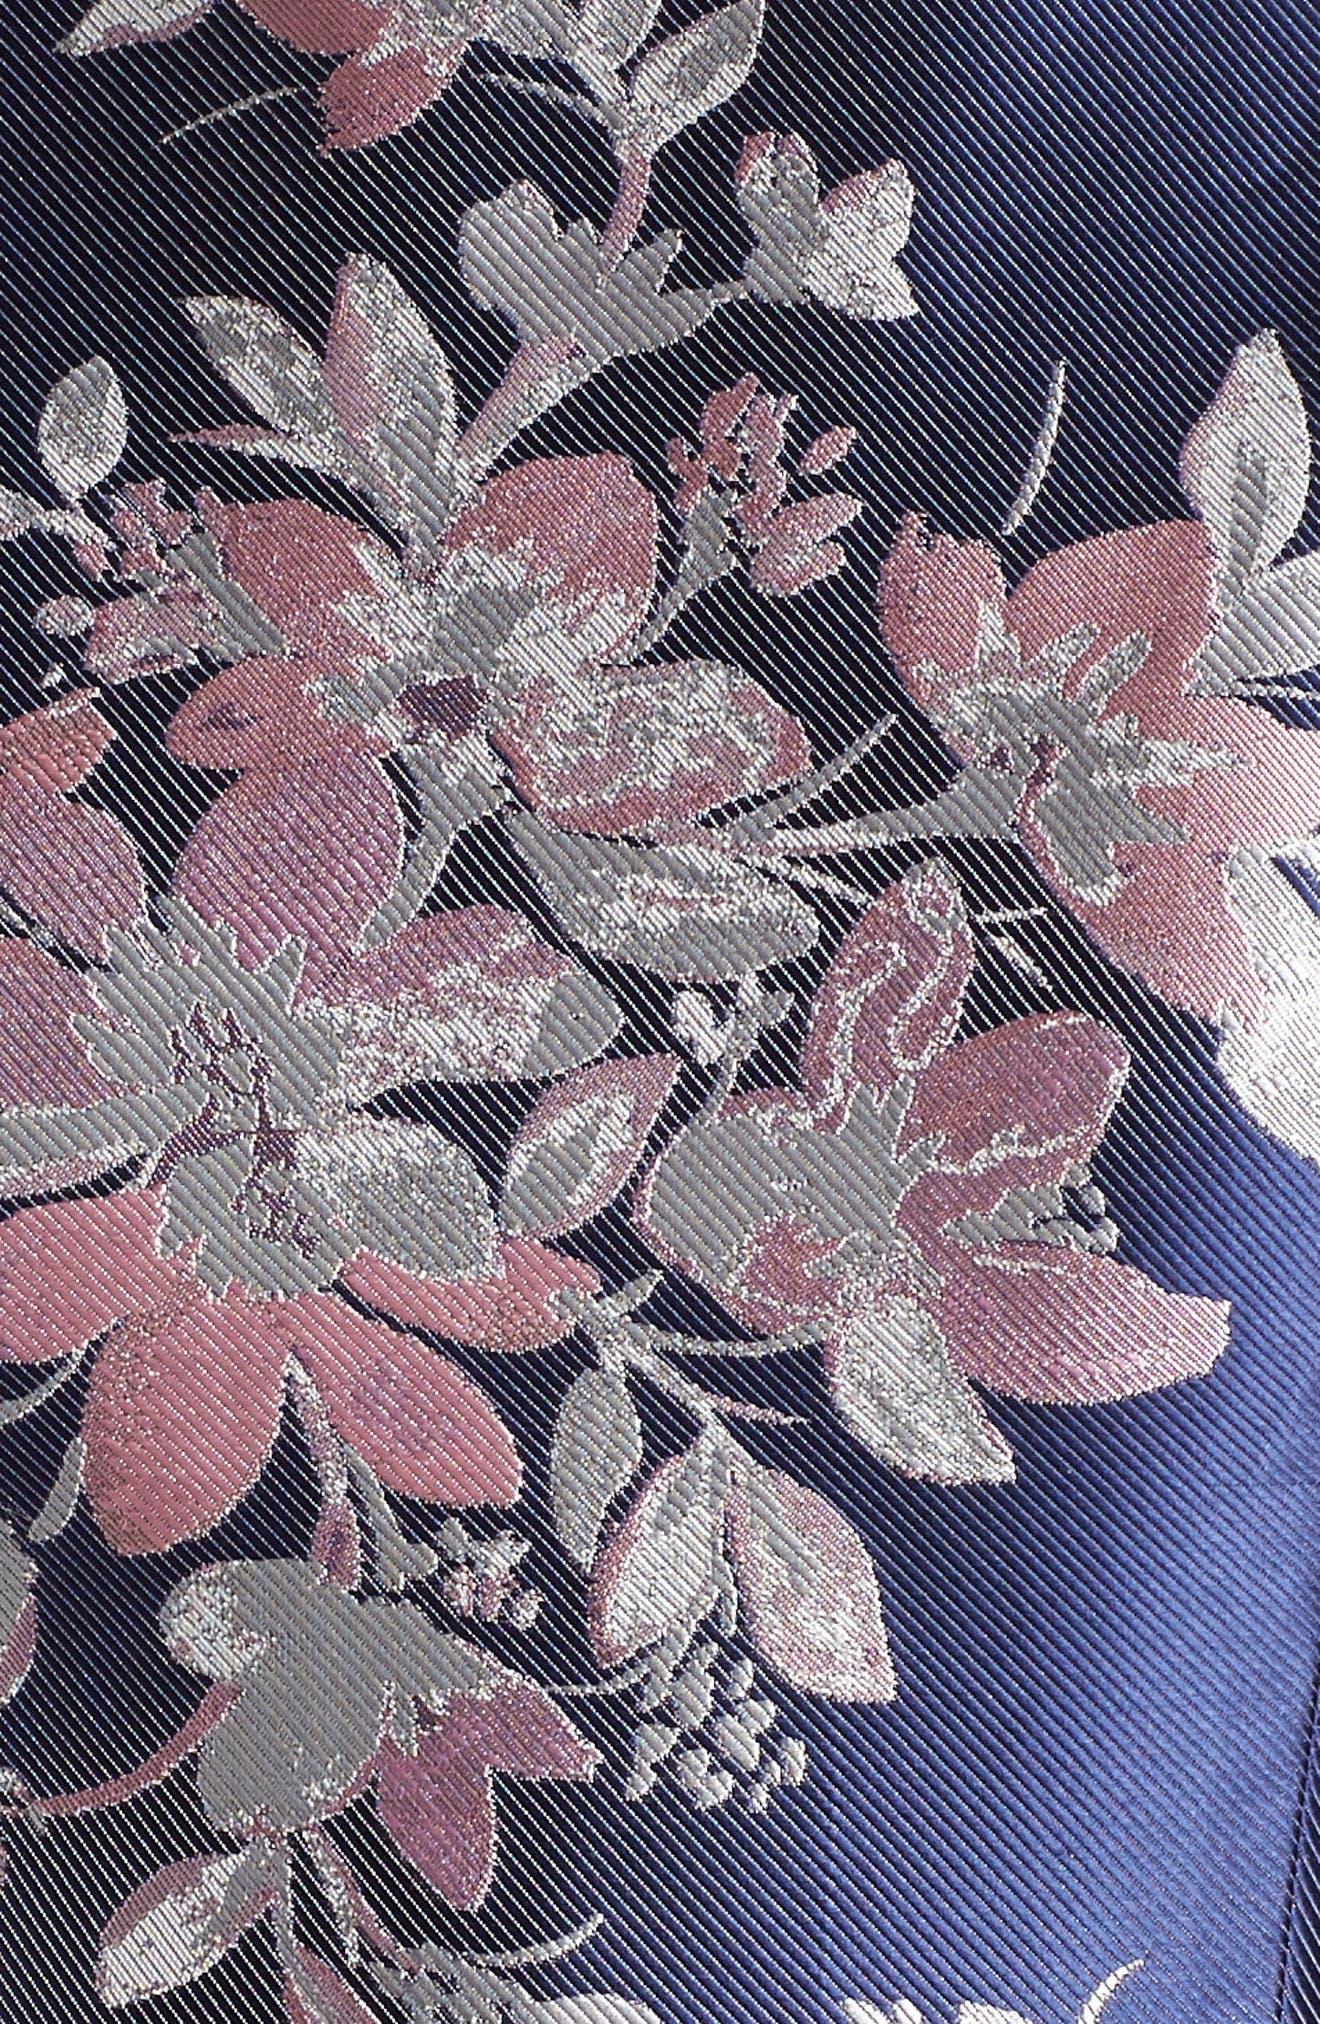 Floral Jacquard Fit & Flare Dress,                             Alternate thumbnail 5, color,                             Navy